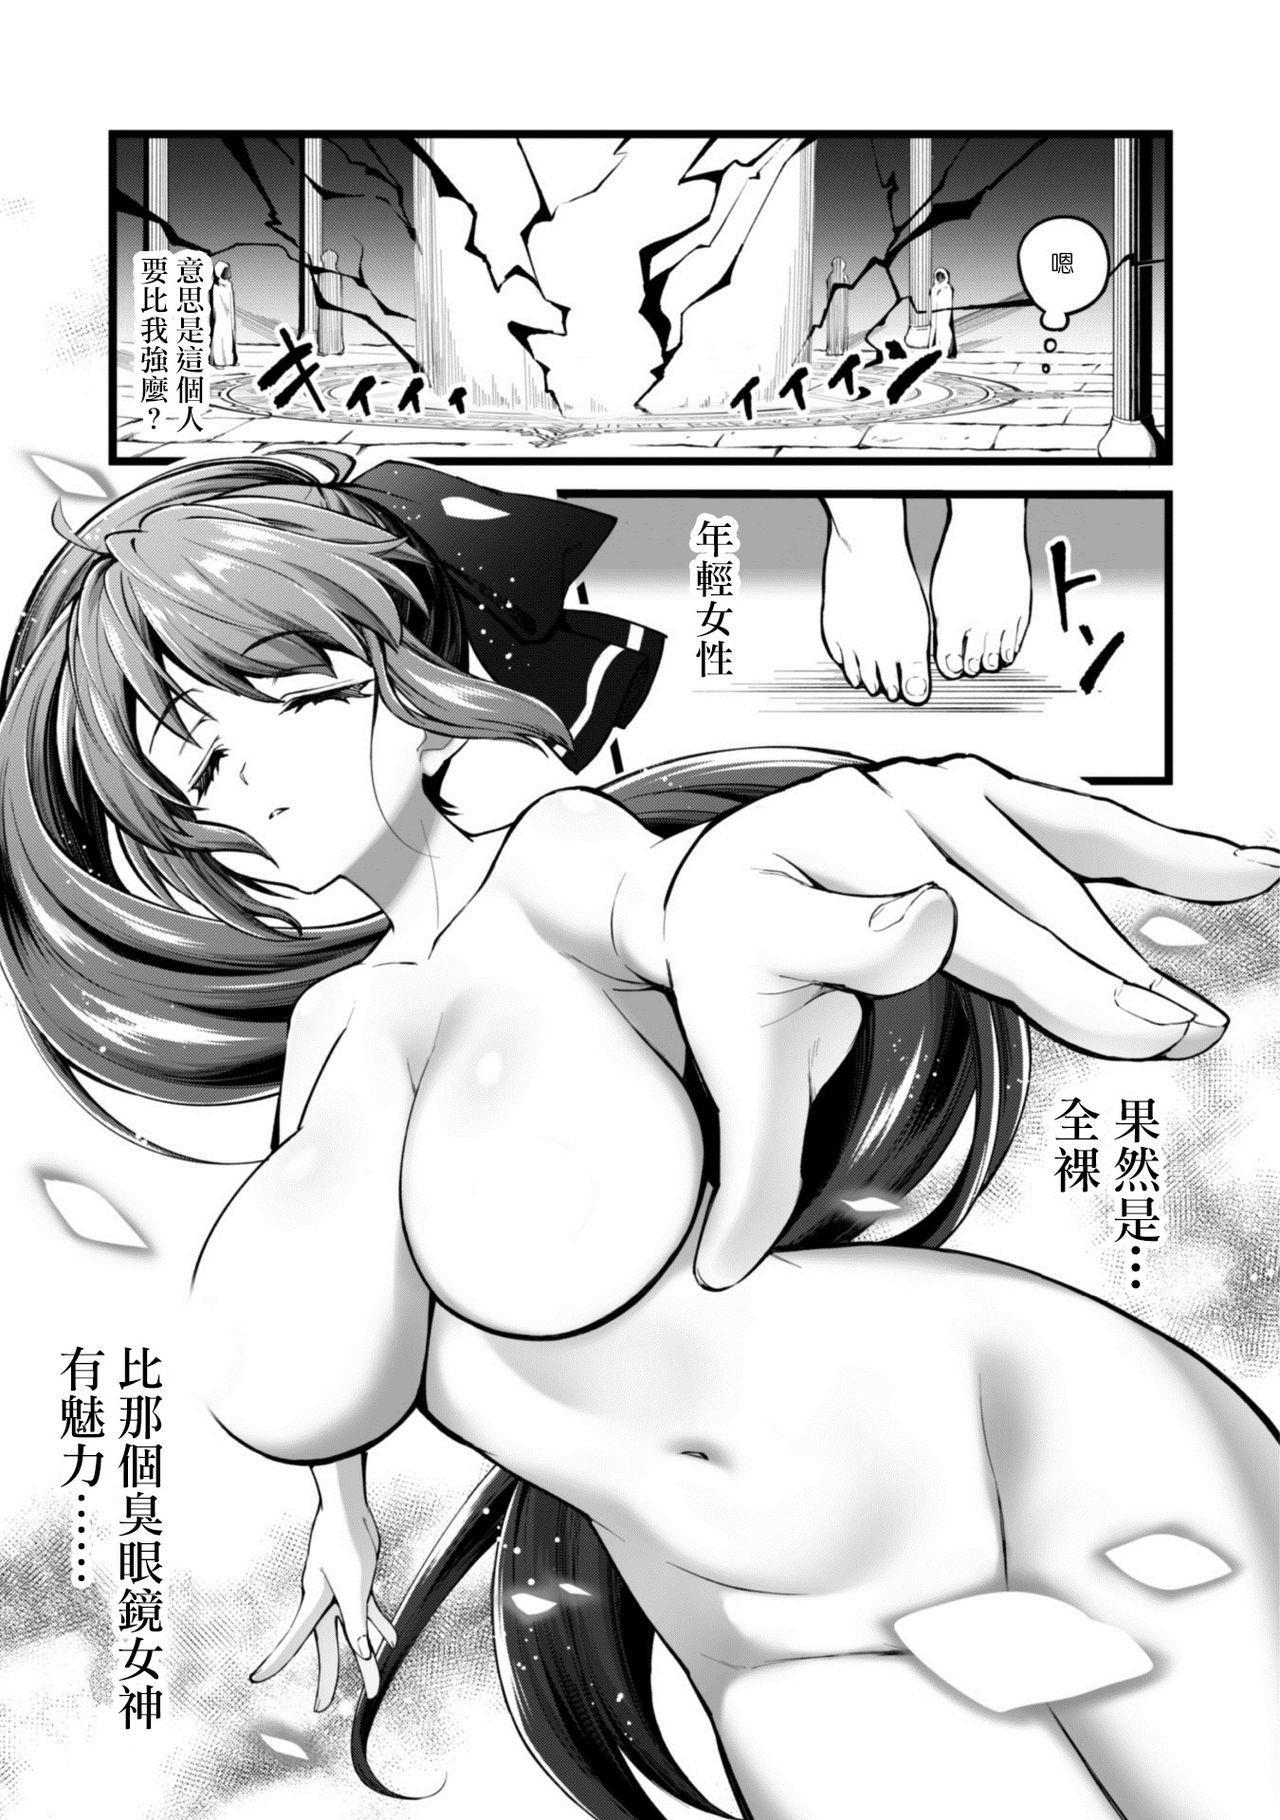 Eroi Skill de Isekai Musou Ch. 1 29